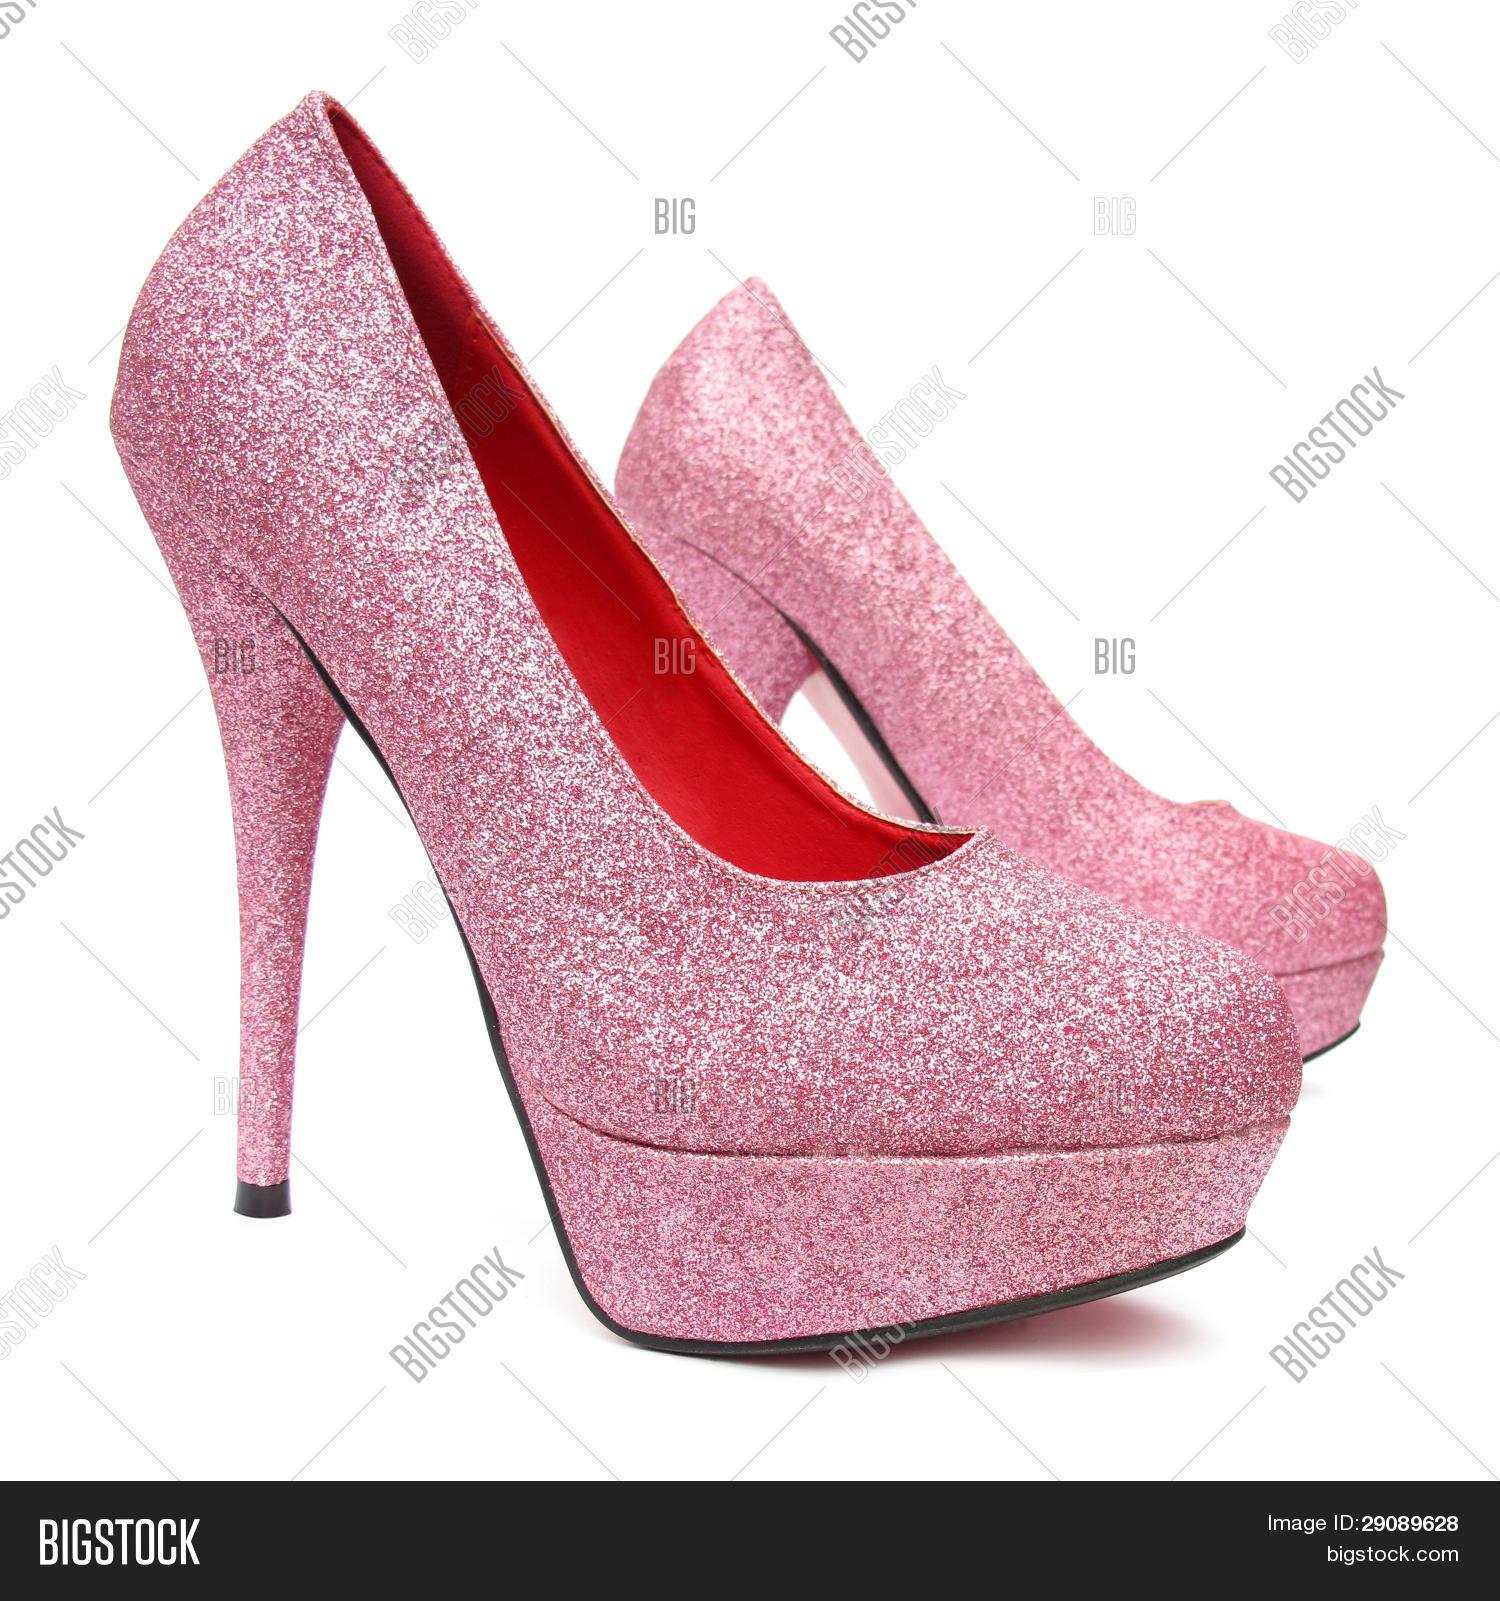 pink high heels pump shoes image photo bigstock. Black Bedroom Furniture Sets. Home Design Ideas